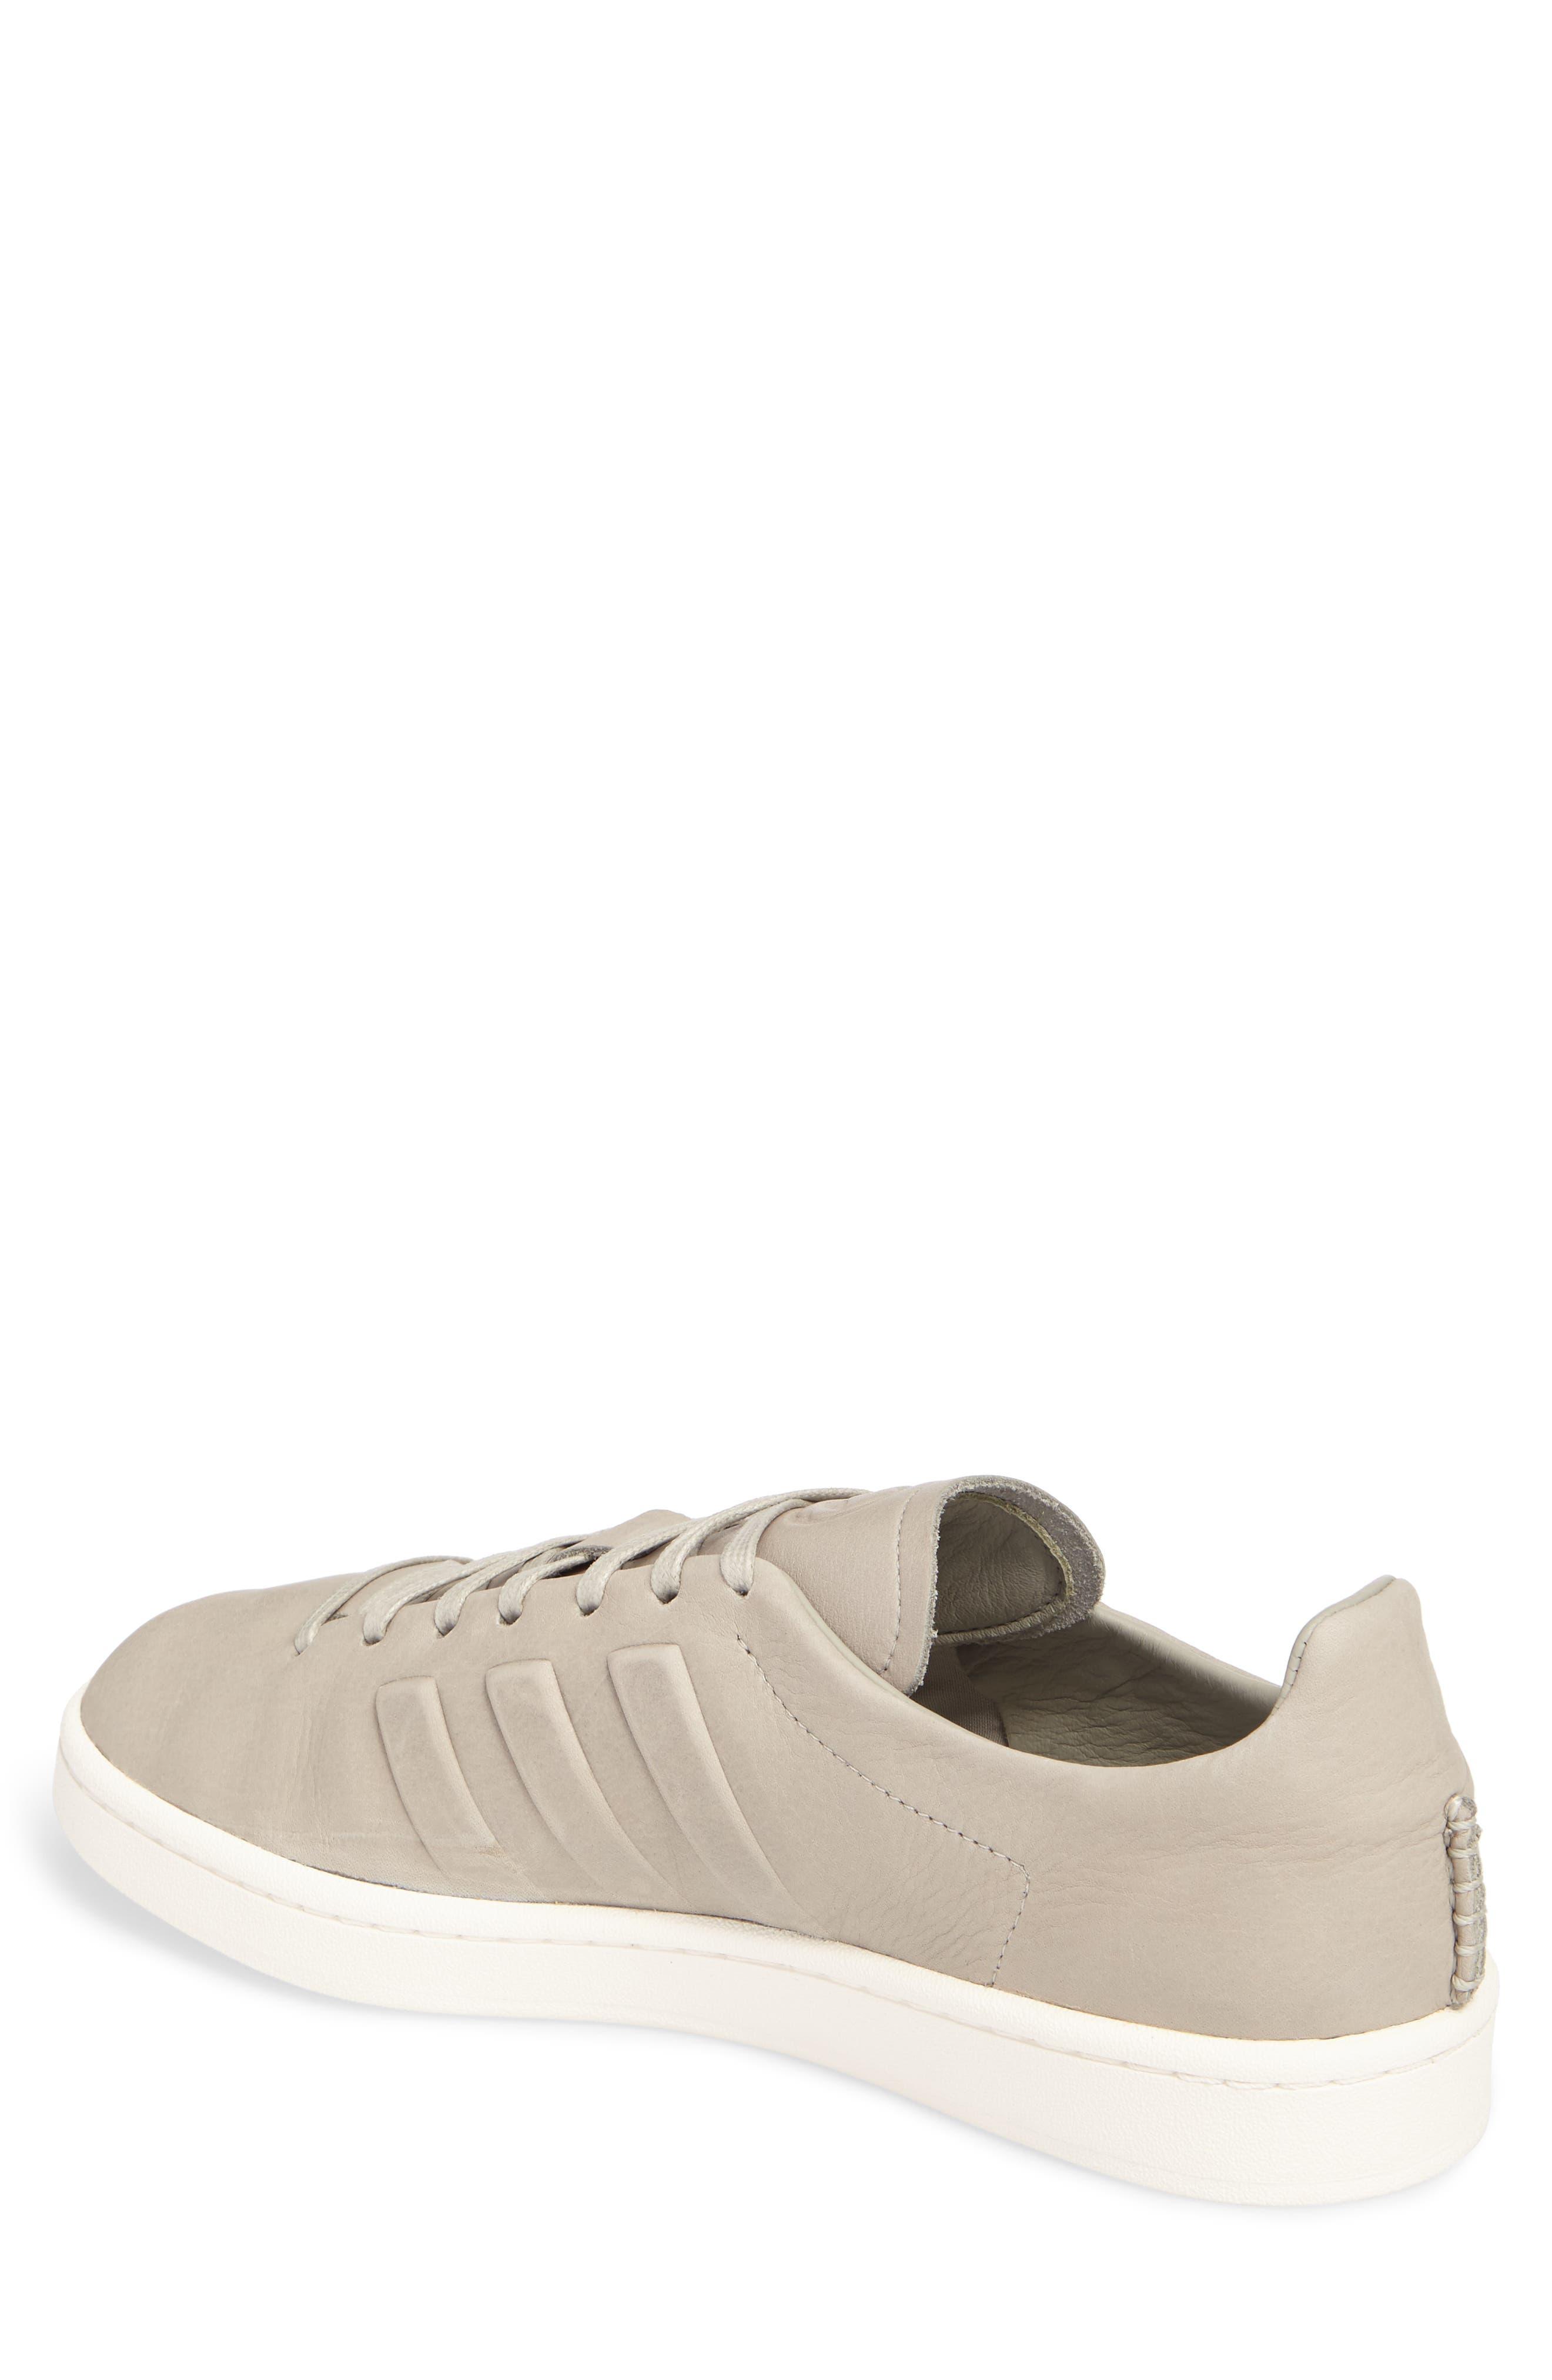 Low Top Sneaker,                             Alternate thumbnail 2, color,                             Sesame/ Chalk White